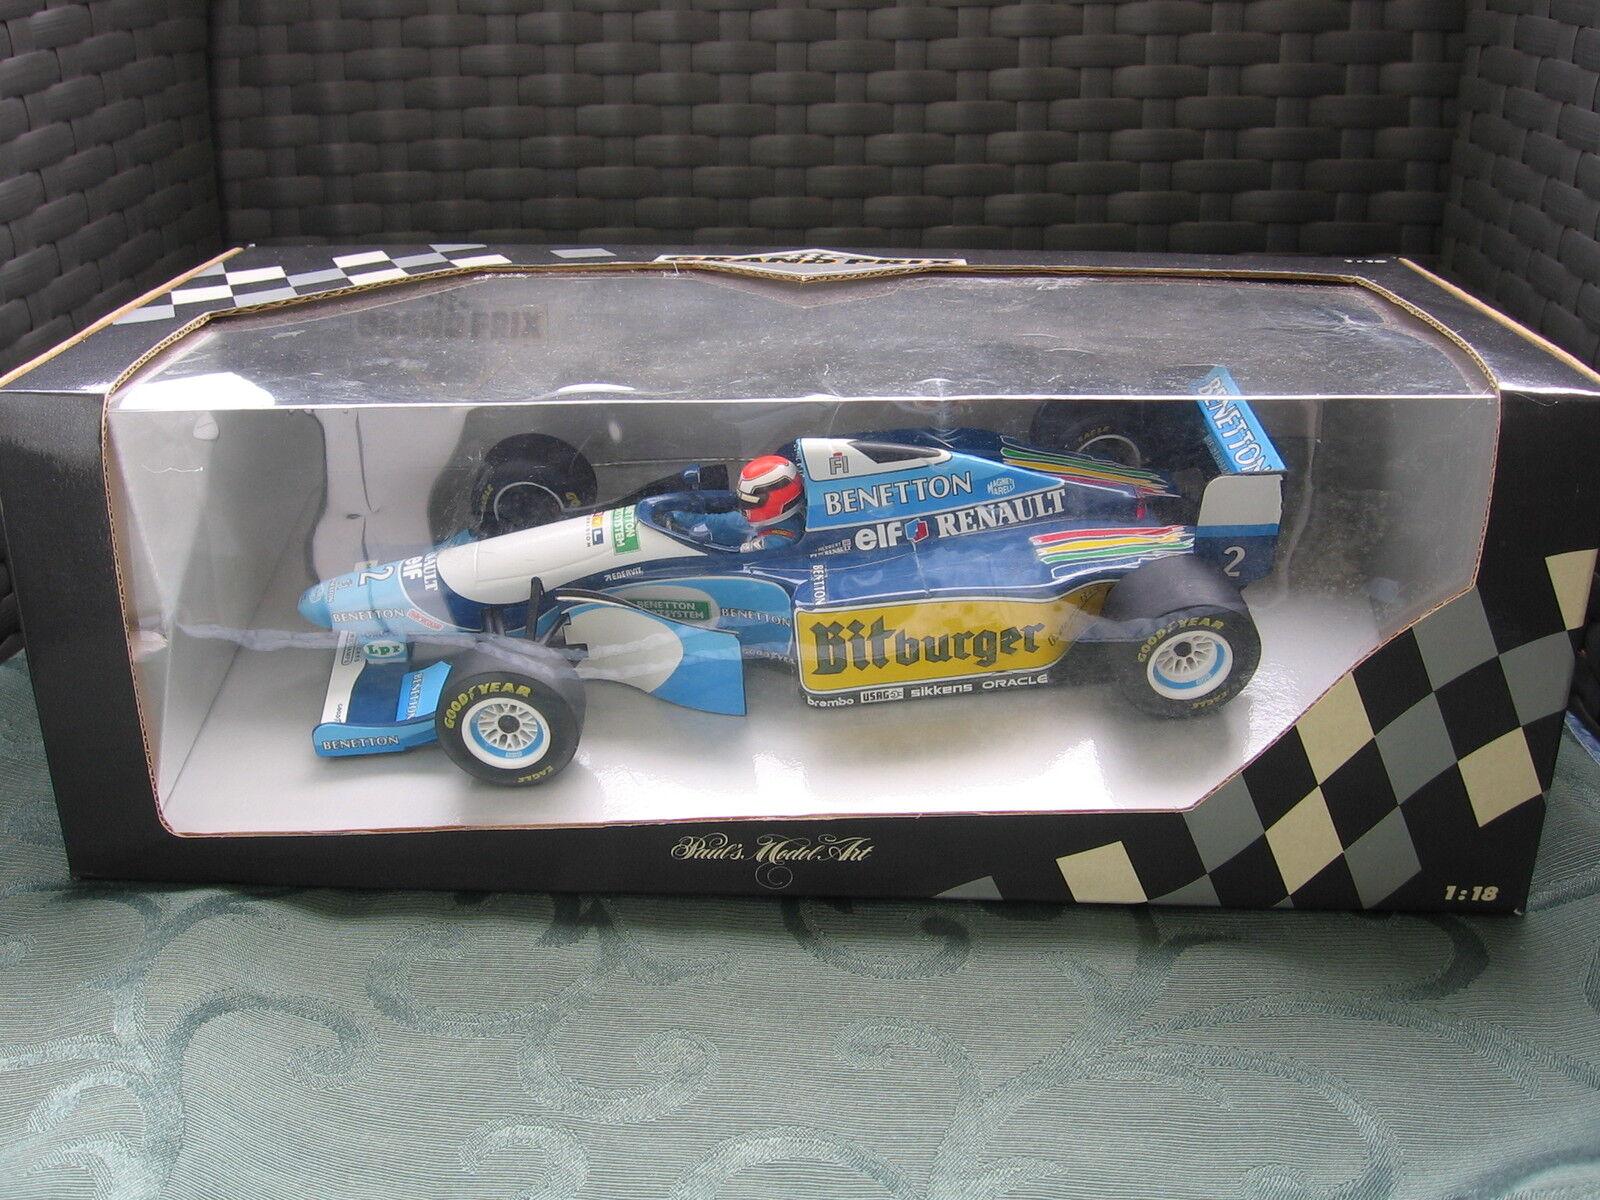 F1 Benetton B 194 5 Showcar 1995 J. HERBERT Minichamps 1 18 limited NEUF Comme neuf